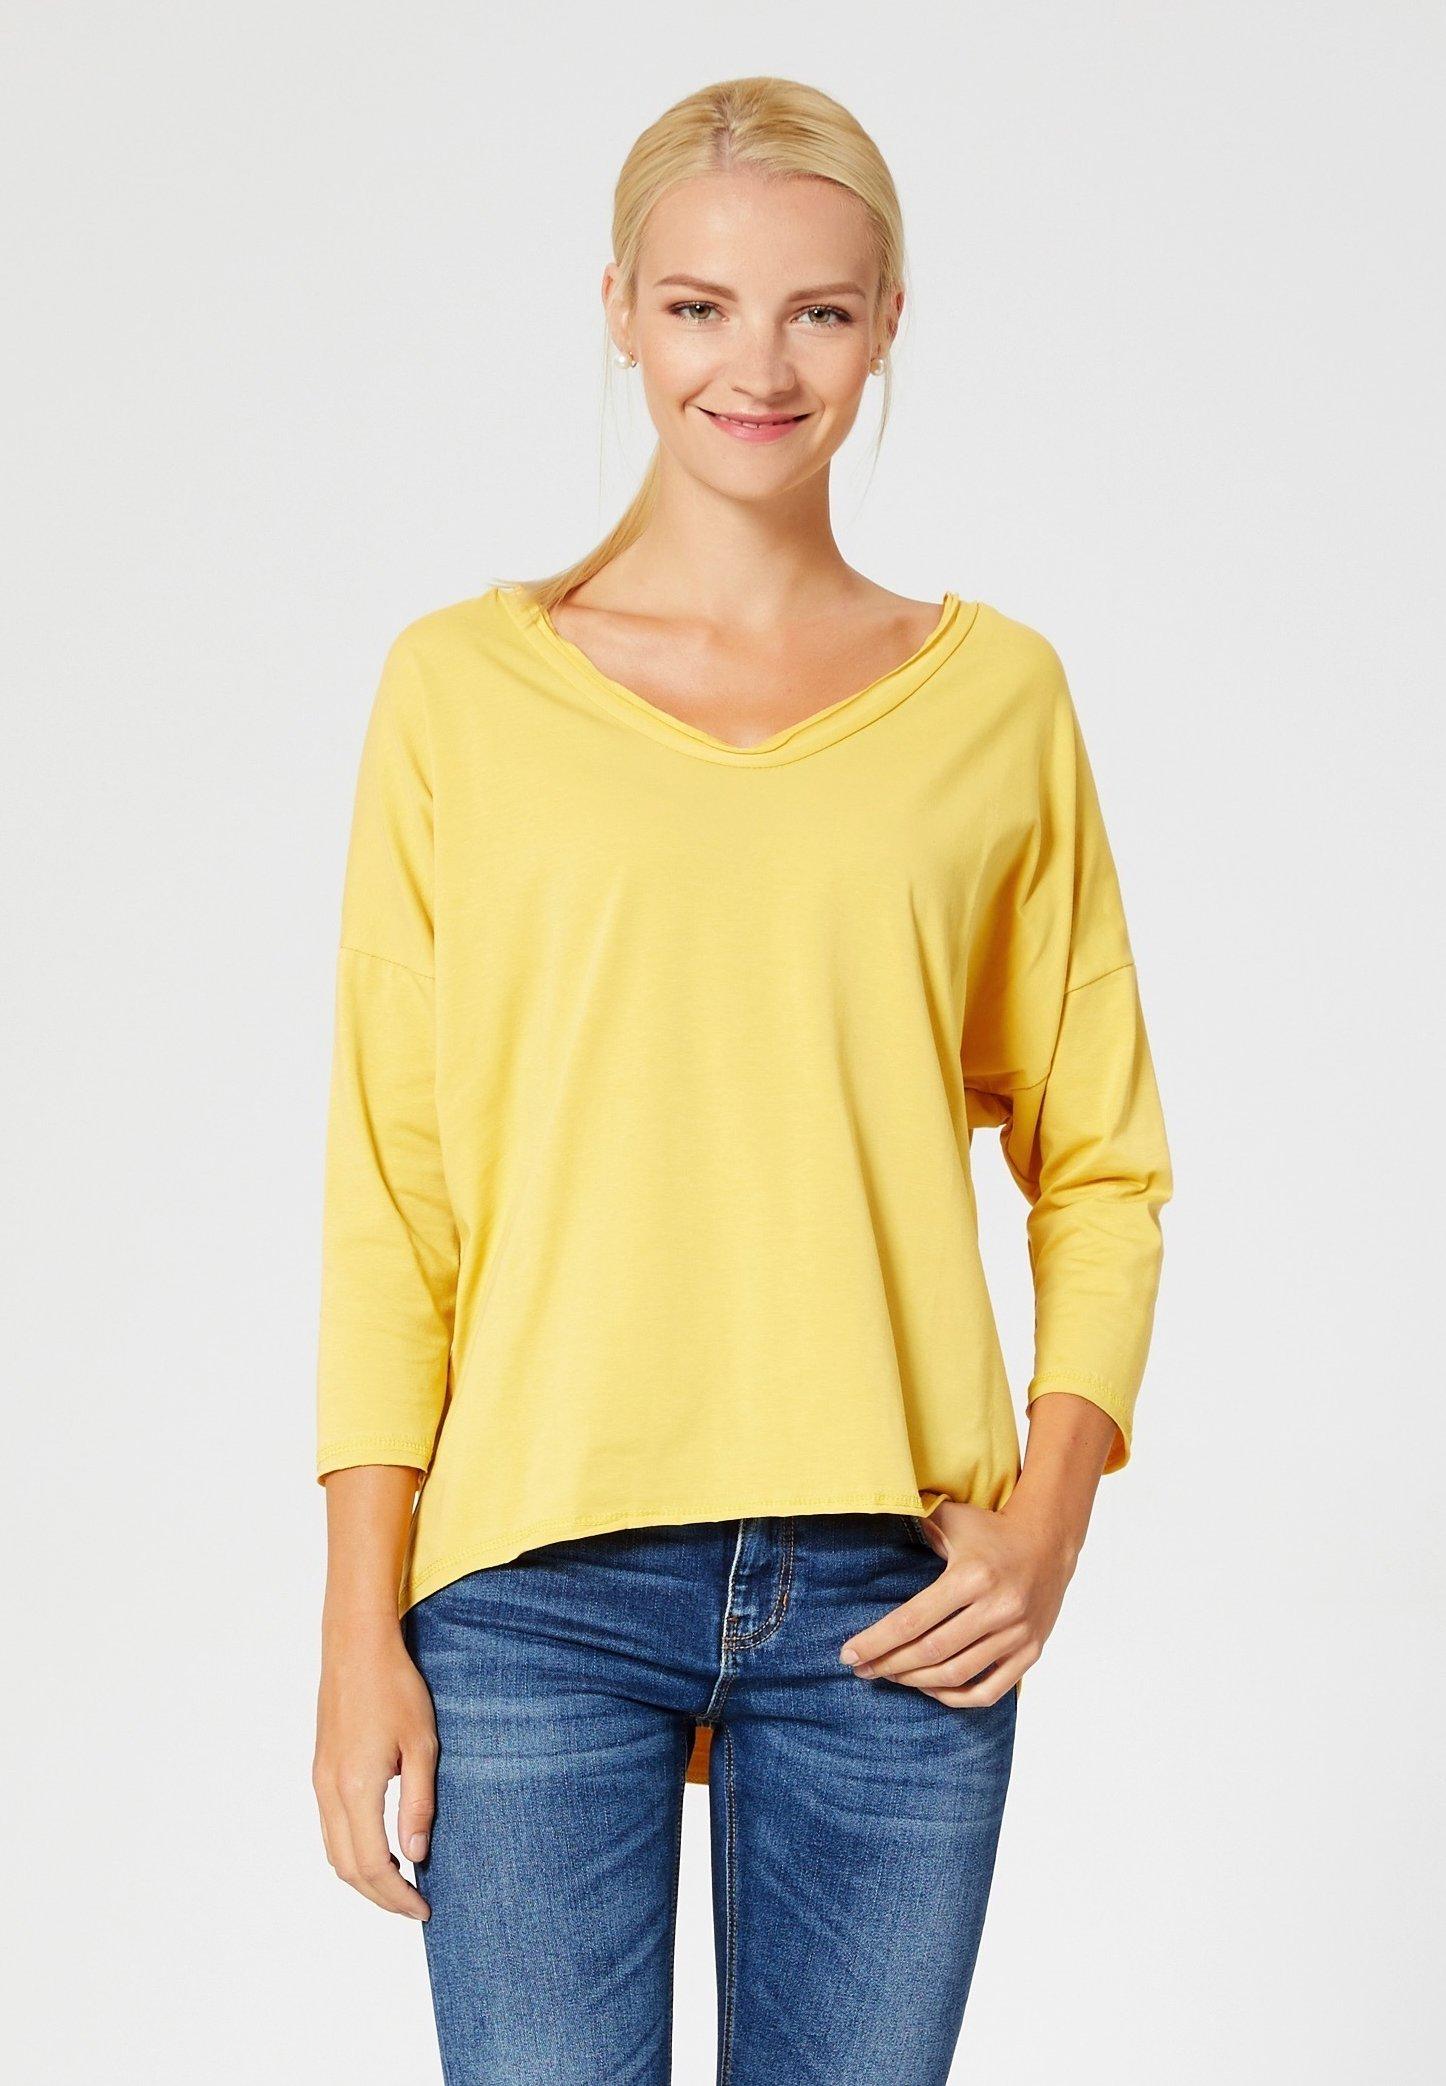 A Usha Manica Maglietta Lunga Yellow Nvm80wnO